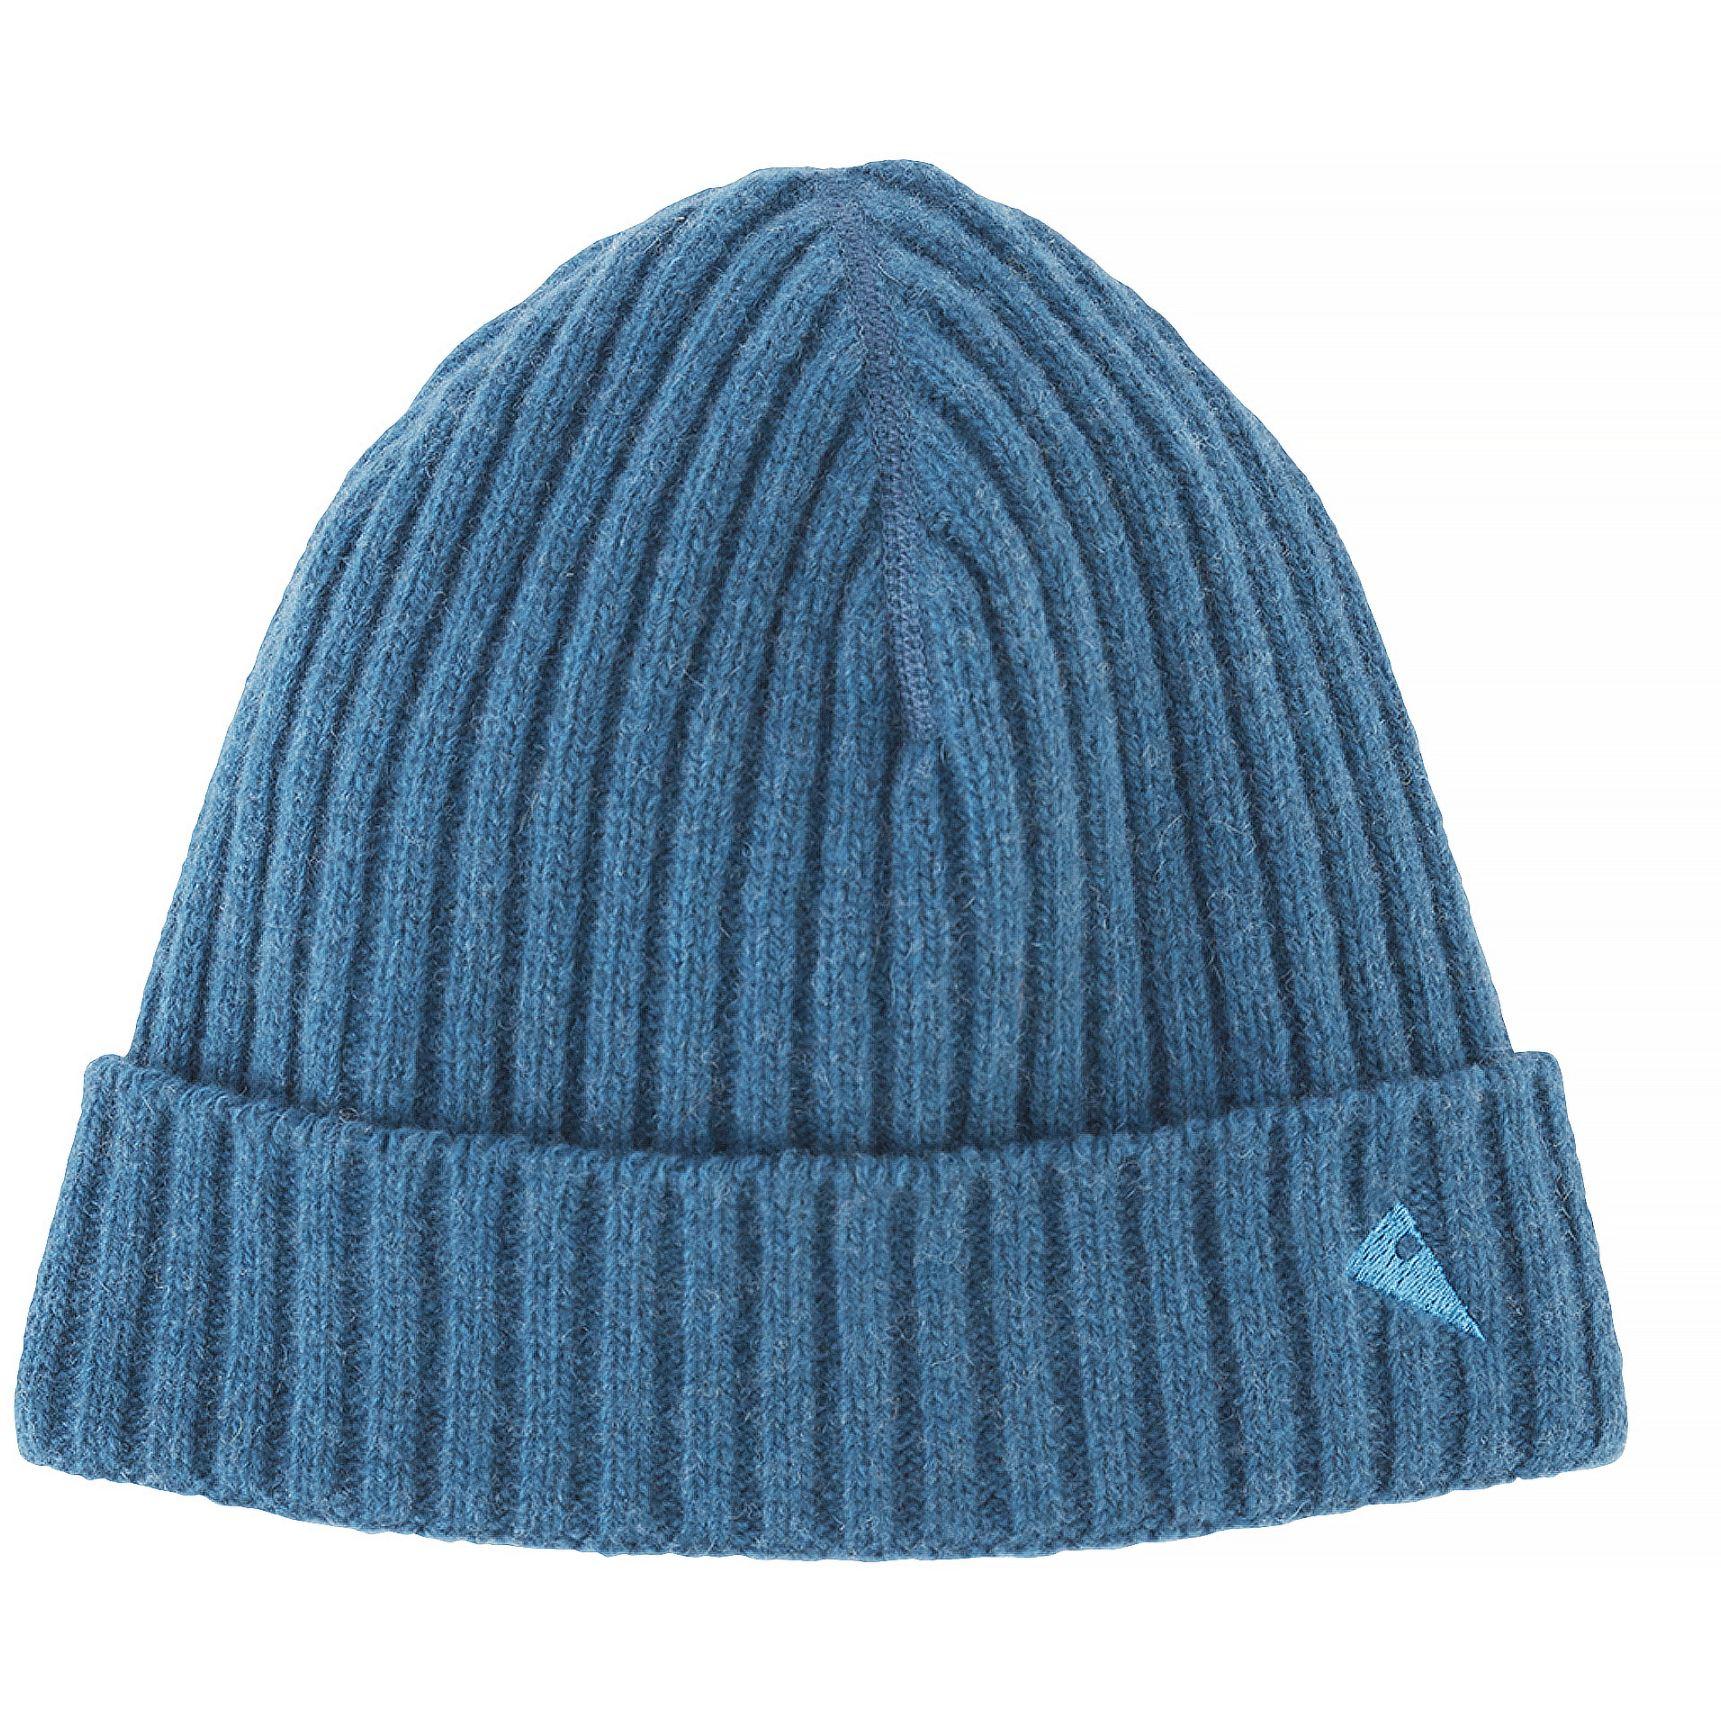 Picture of Klättermusen Barre Ribbed Cap - Blue Sapphire